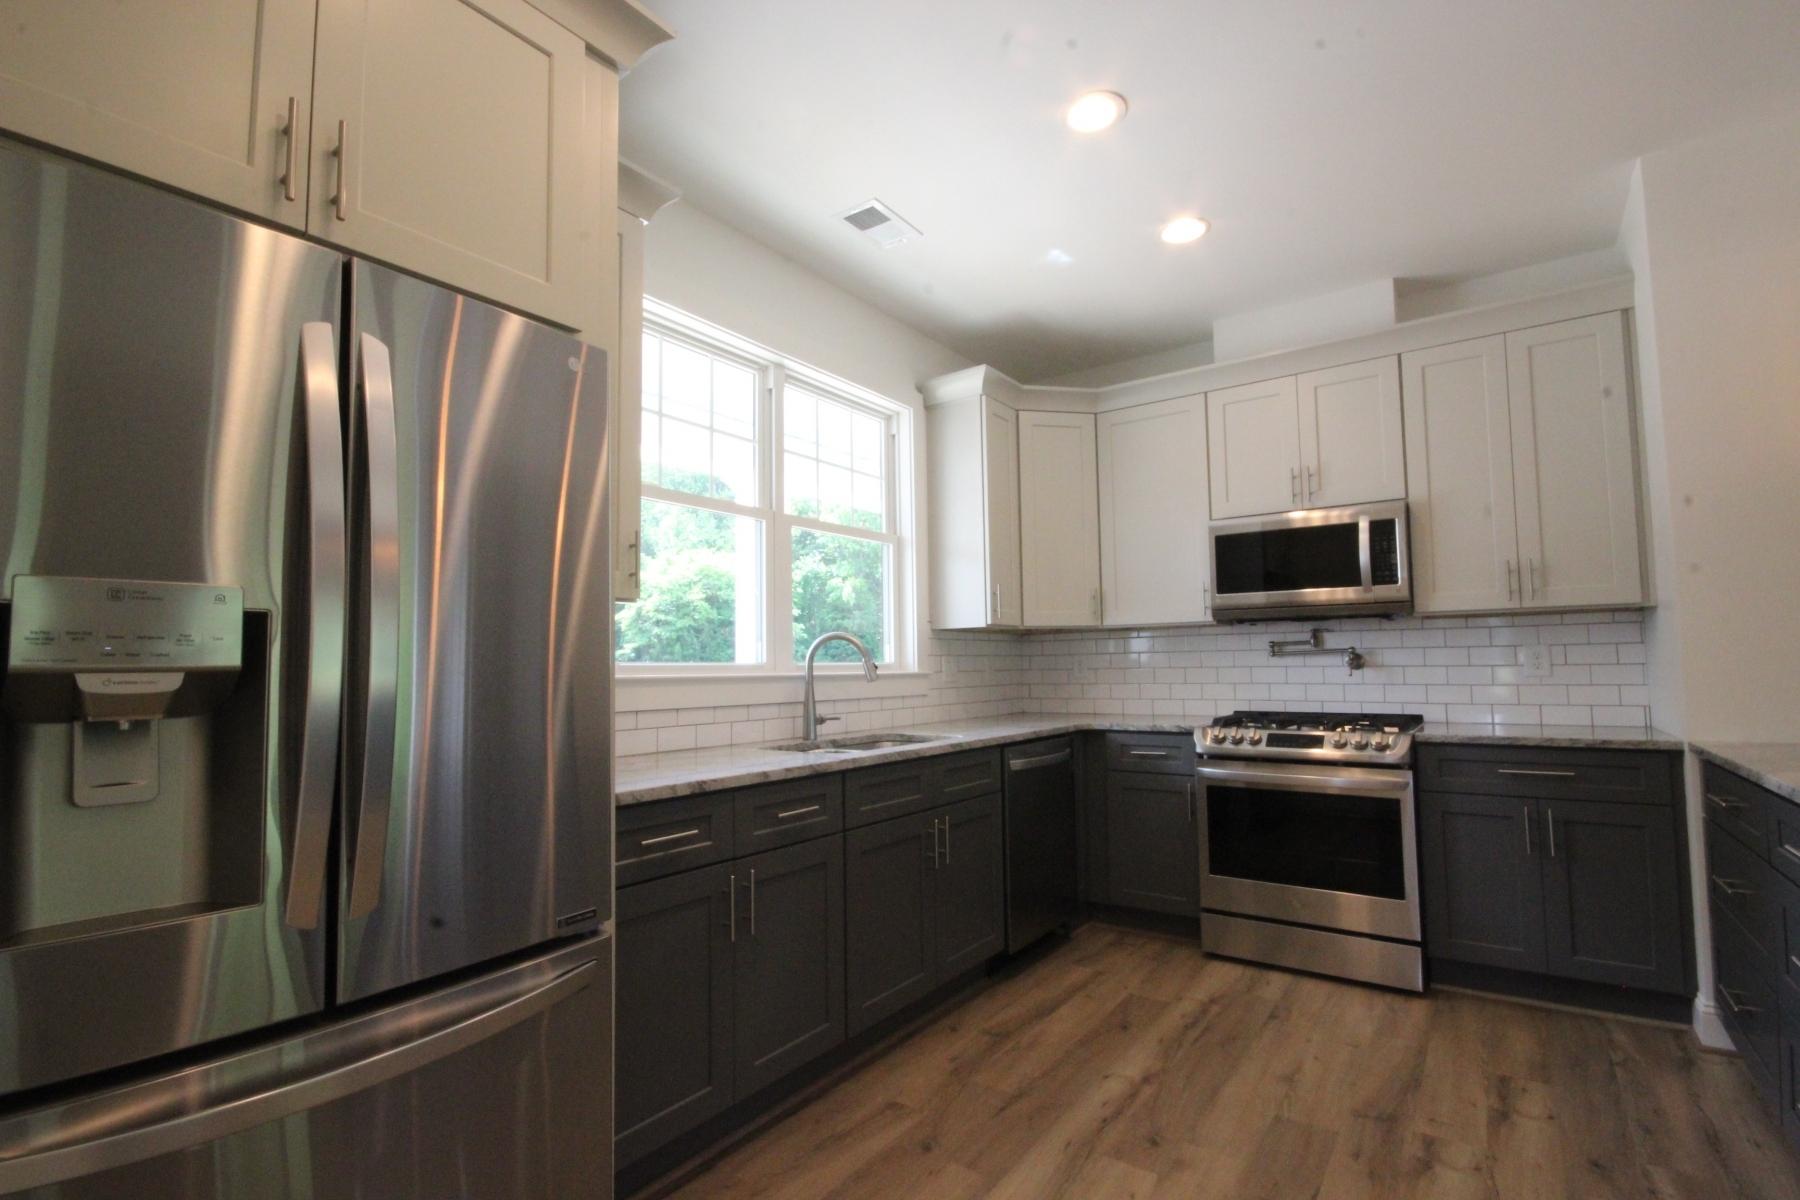 761-ss-kitchen-remodel-1